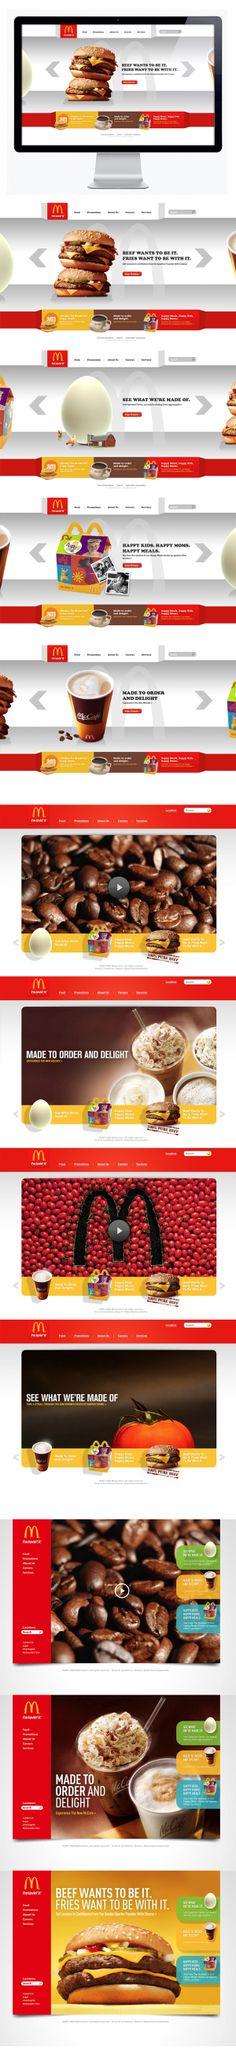 #McDonalds by Moosesyrup, via #Behance #Webdesign